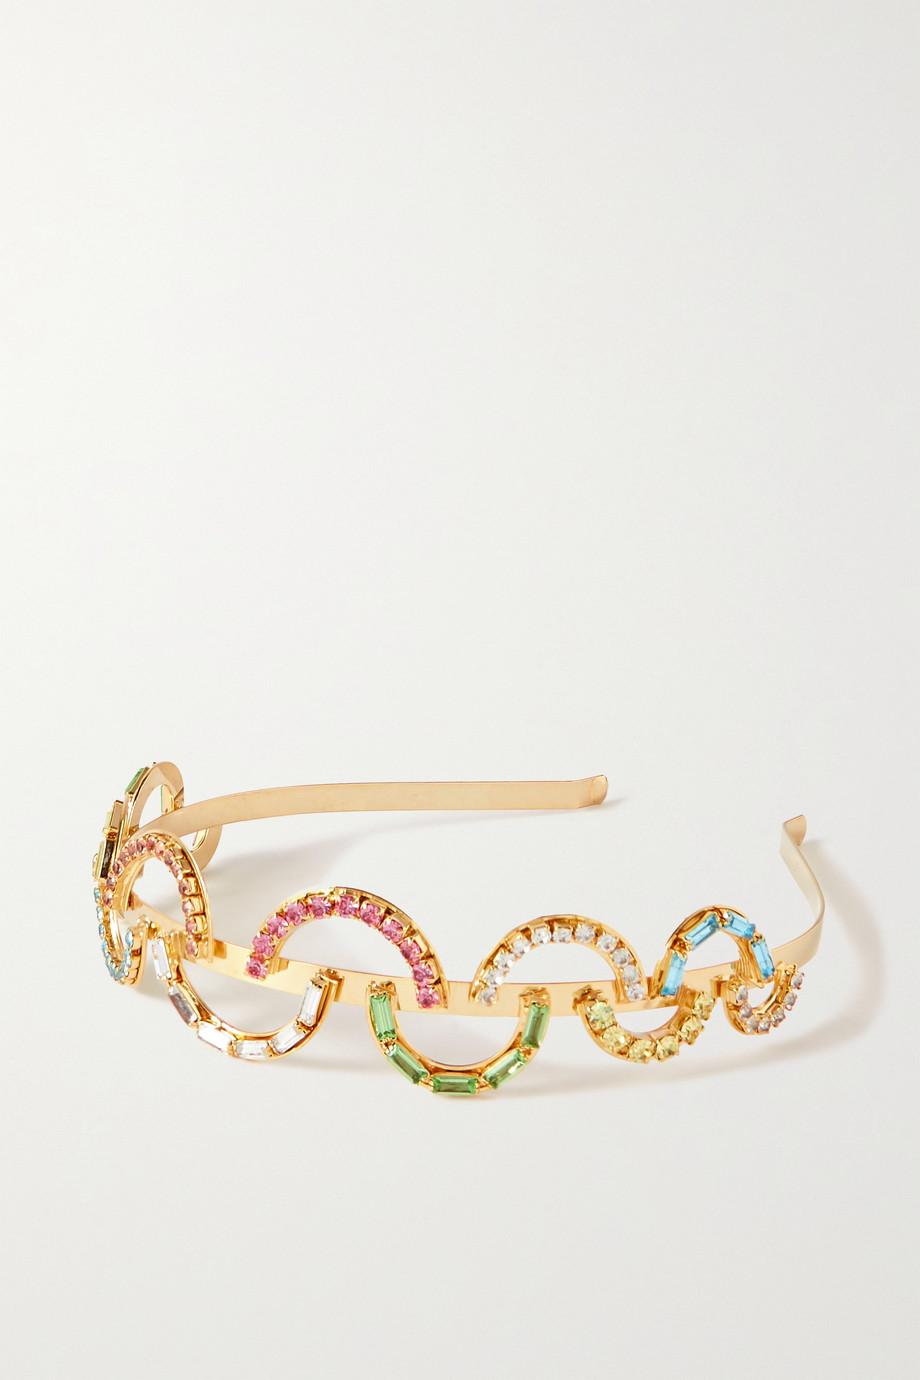 Rosantica Brio goldfarbener Haarreif mit Kristallen